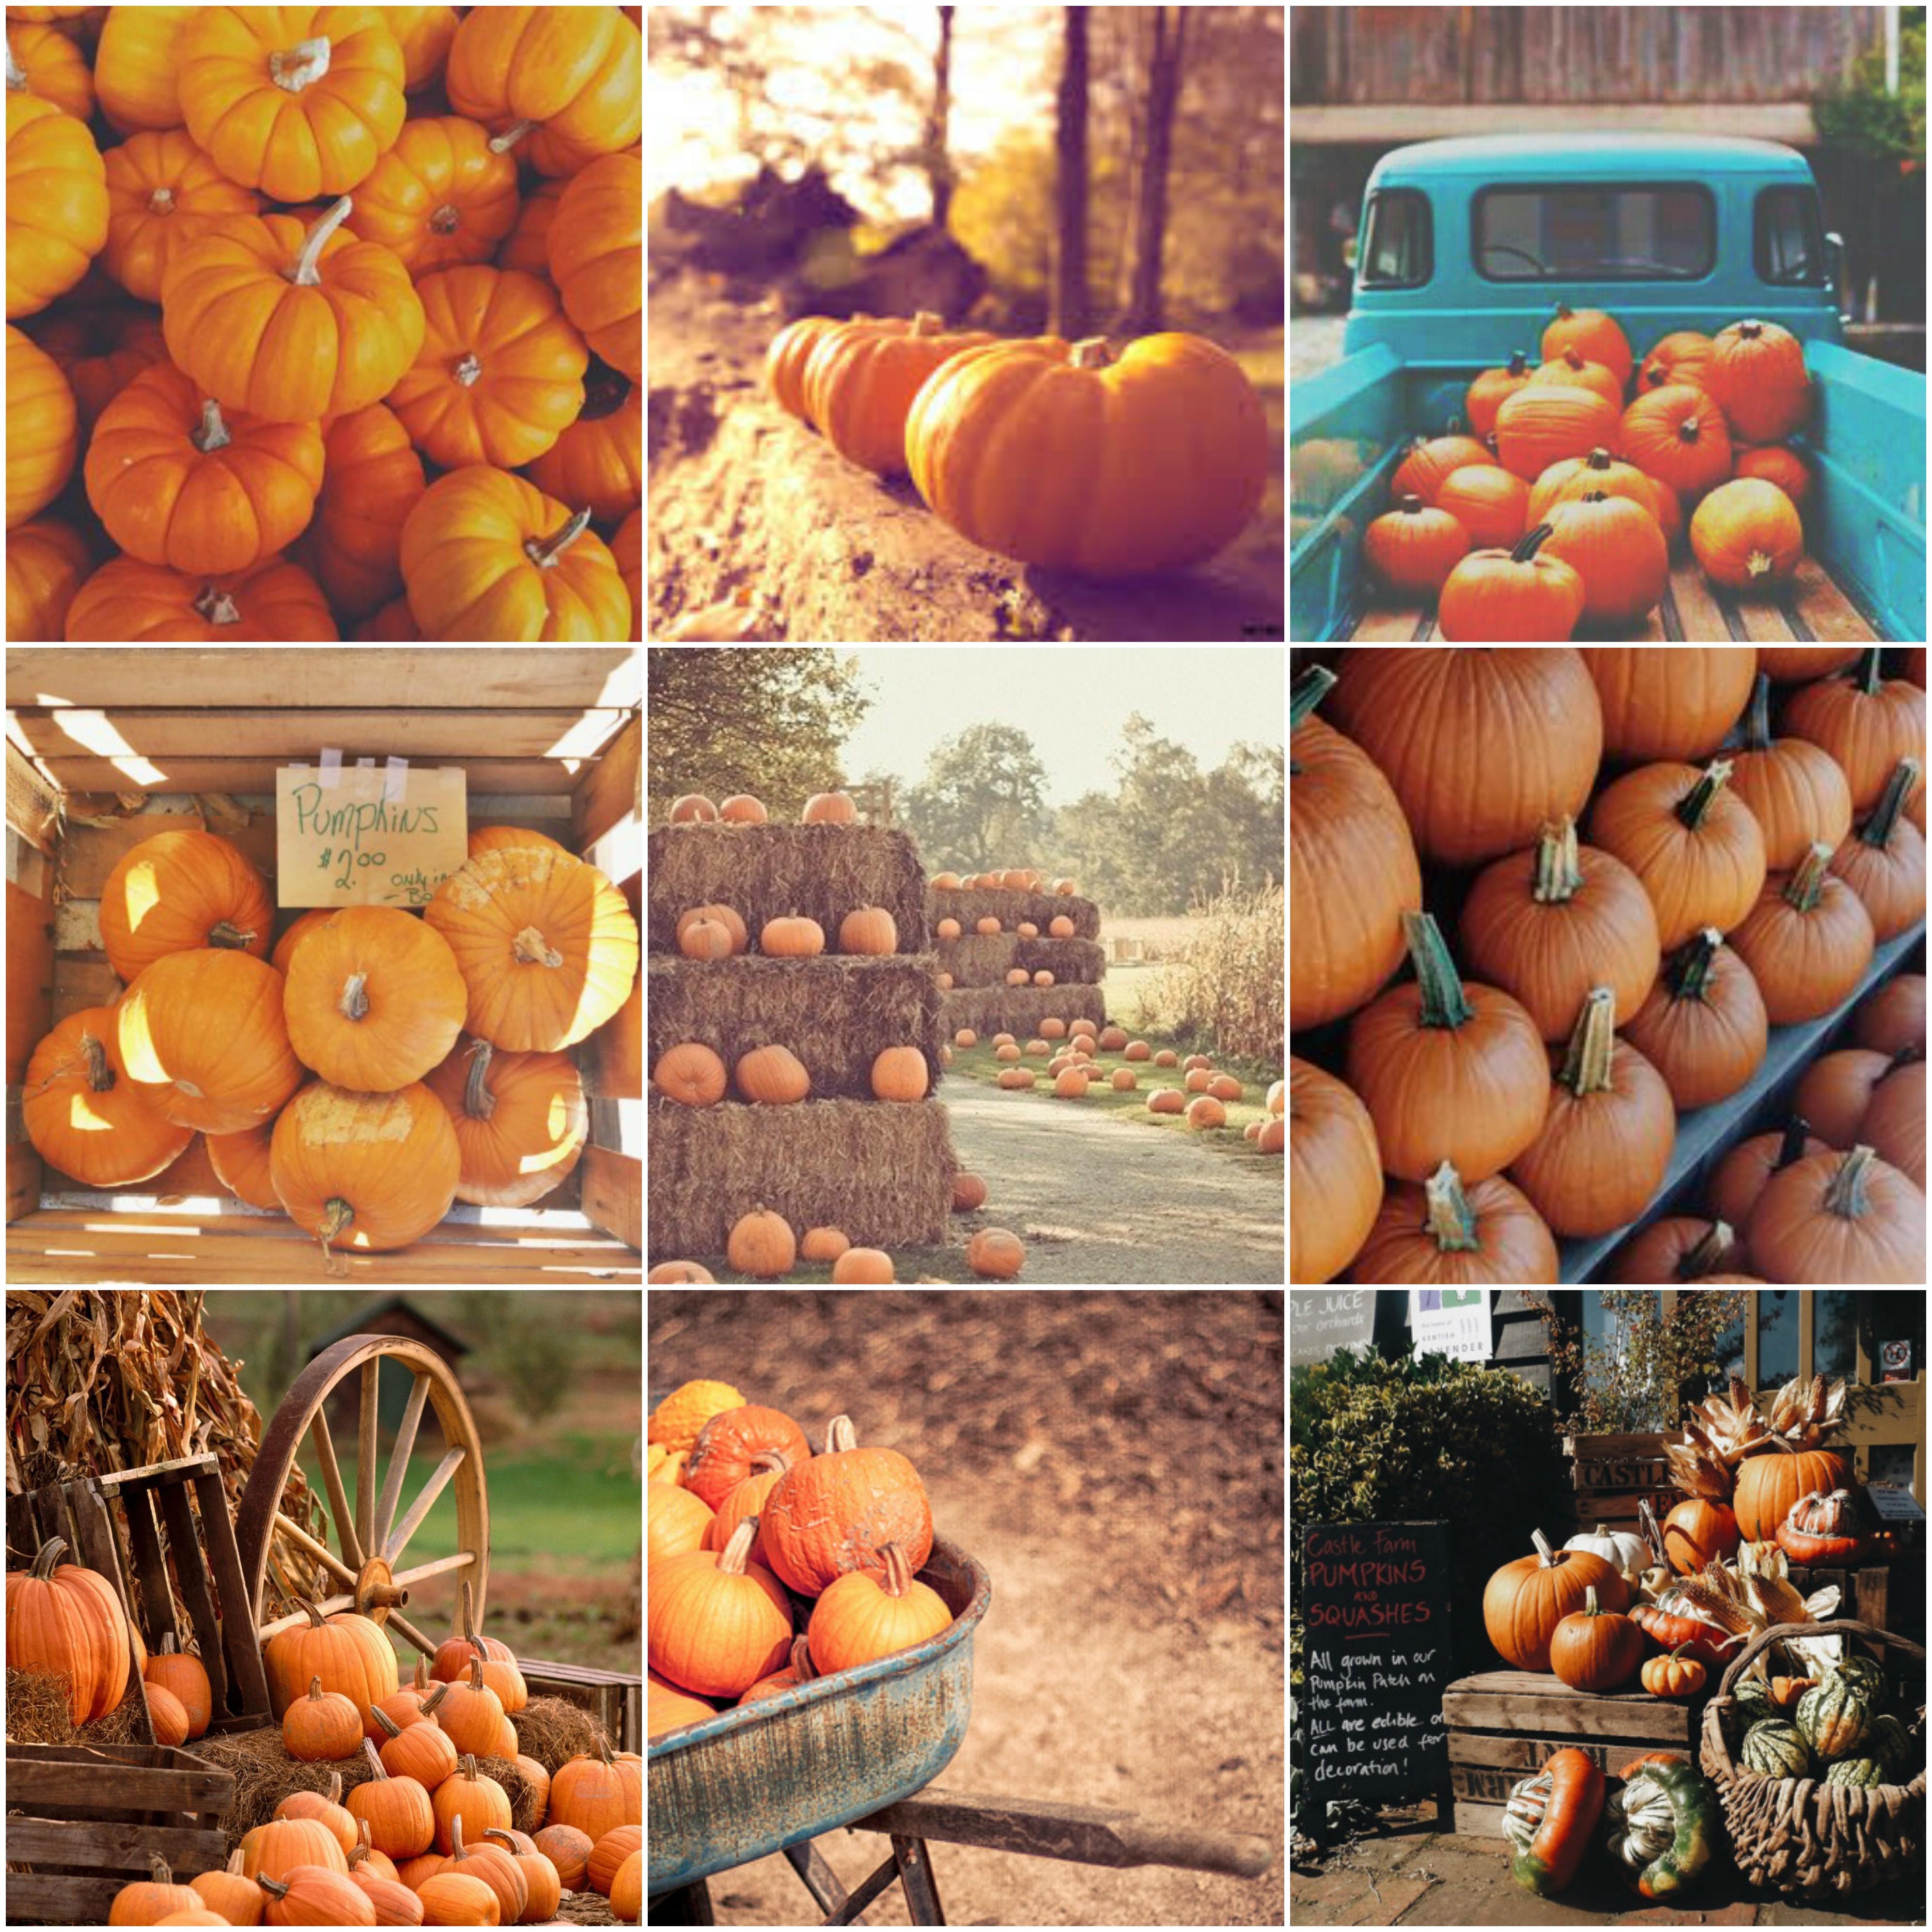 Autumn Pumpkin Themed Collage